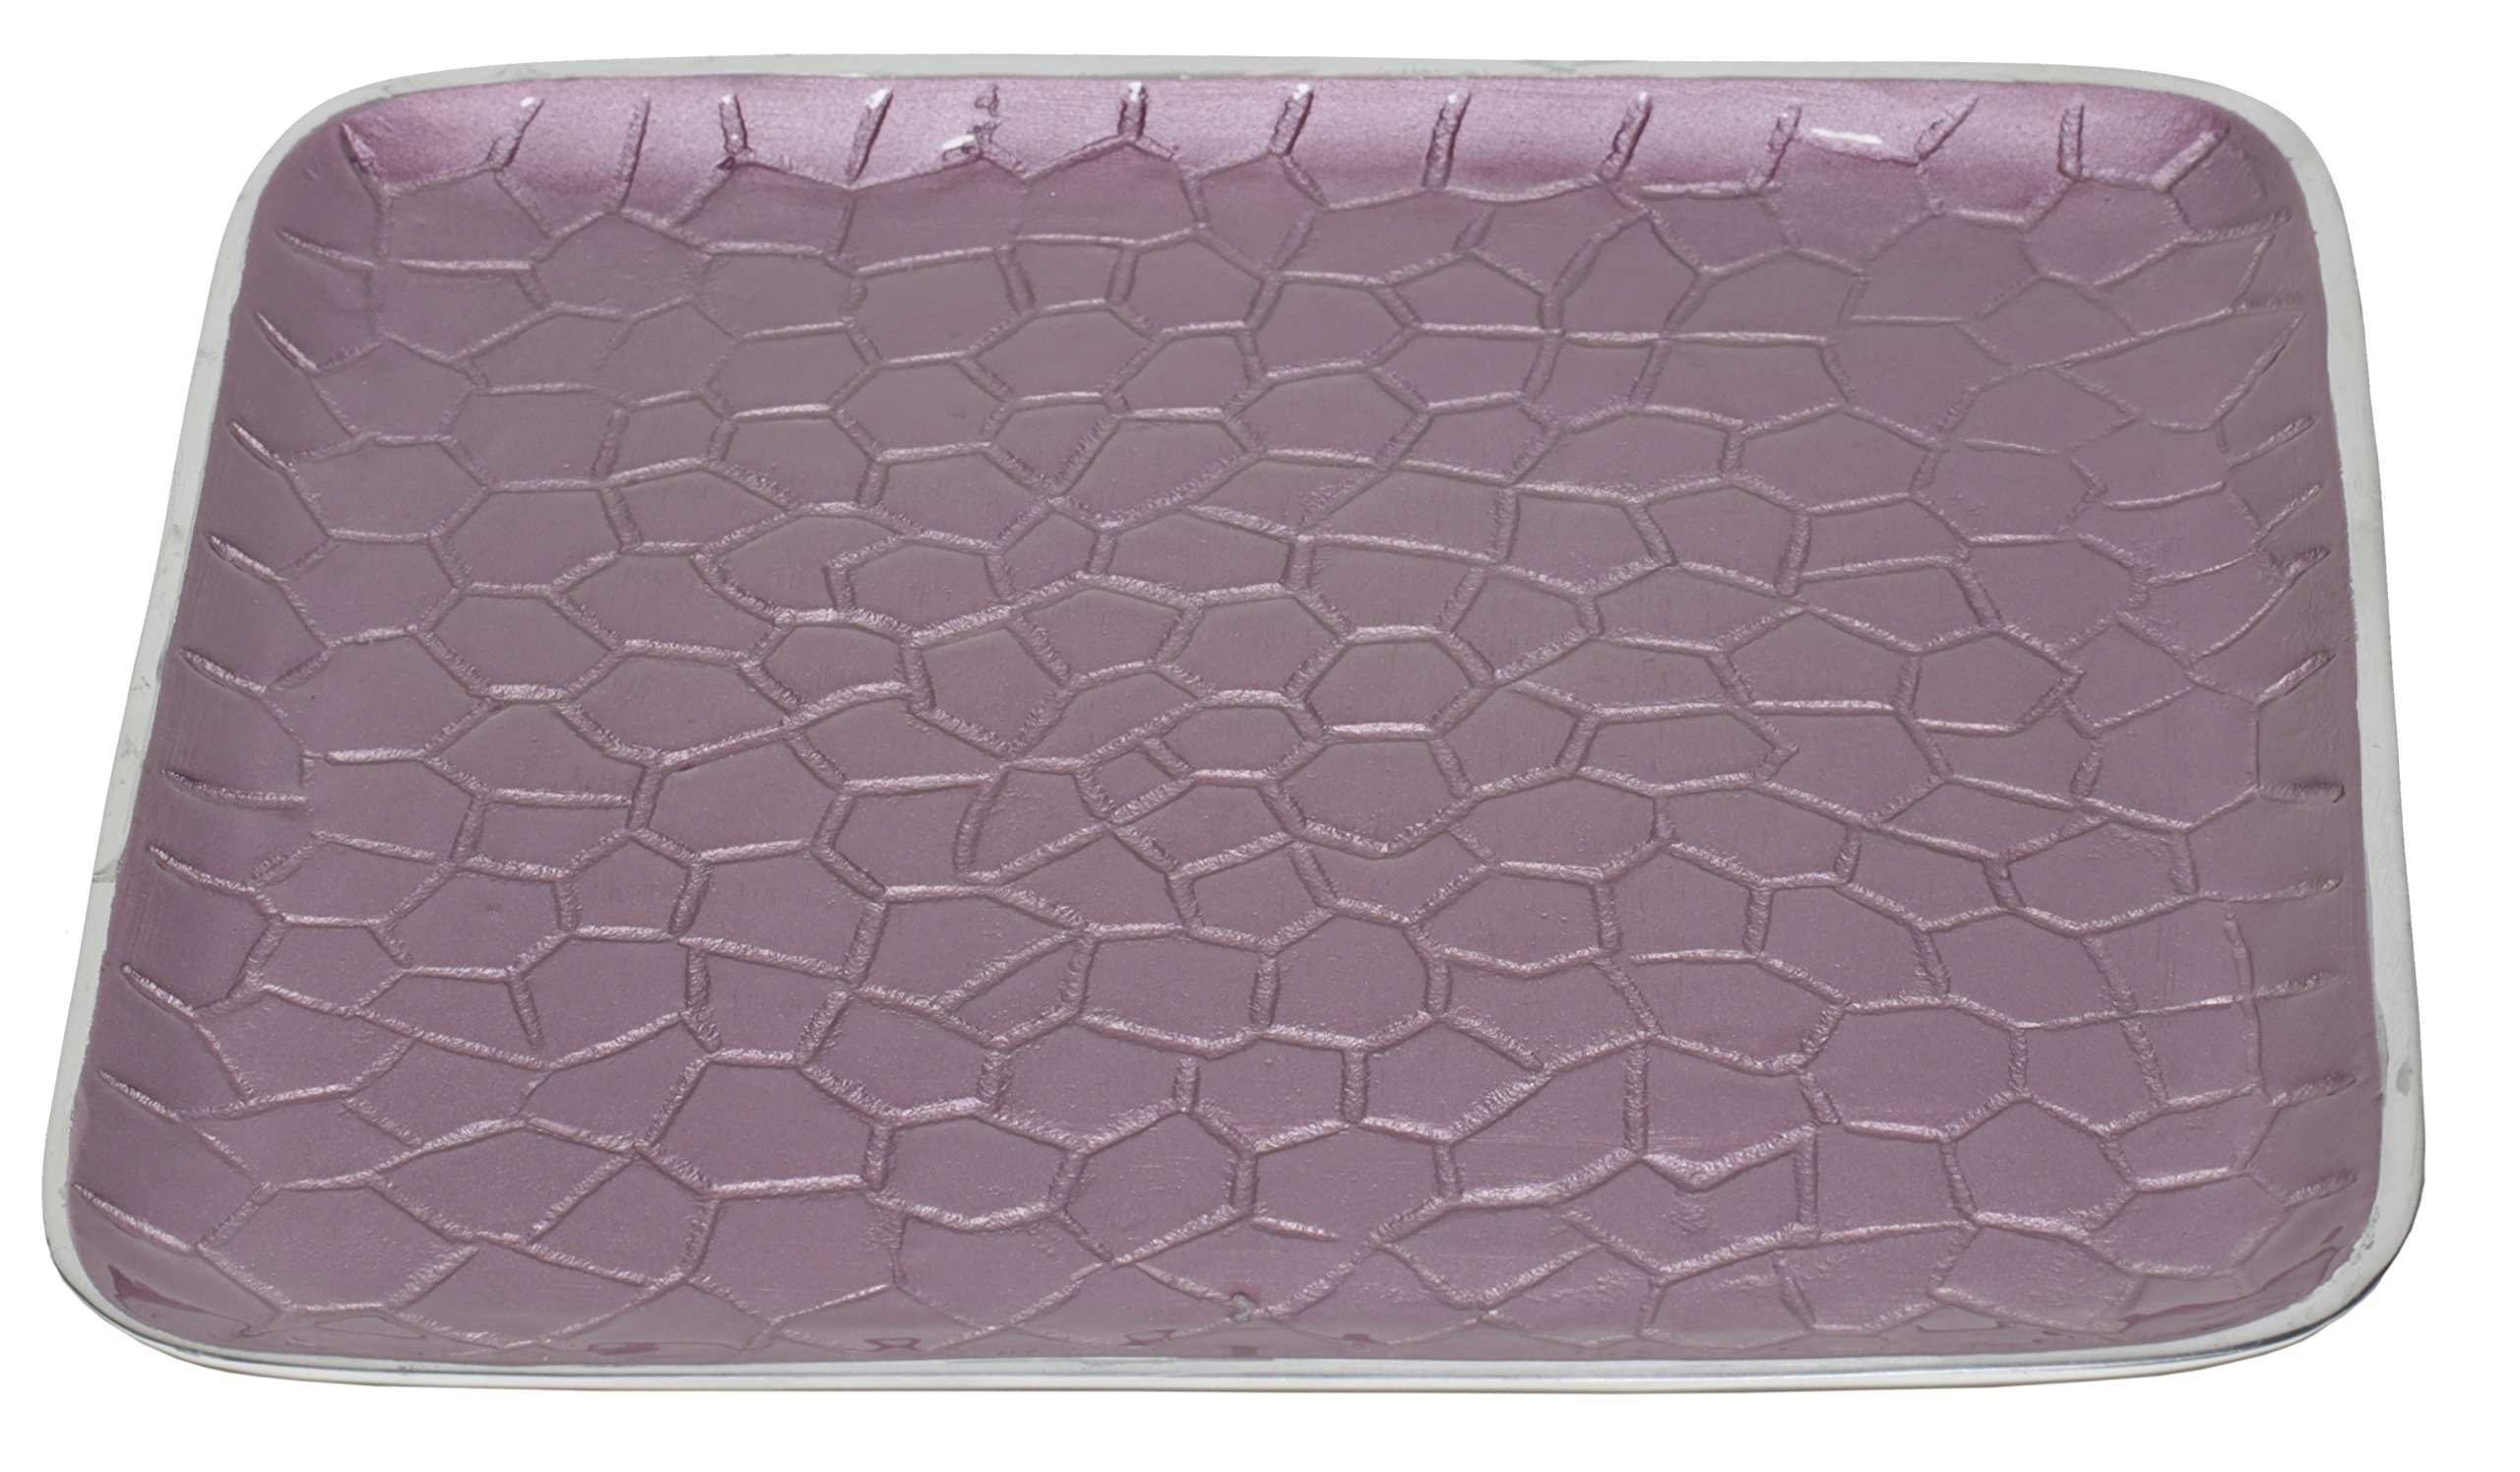 Artisan d'Orient Classic 8'' Square Tray, Color - Purple, Set of 16